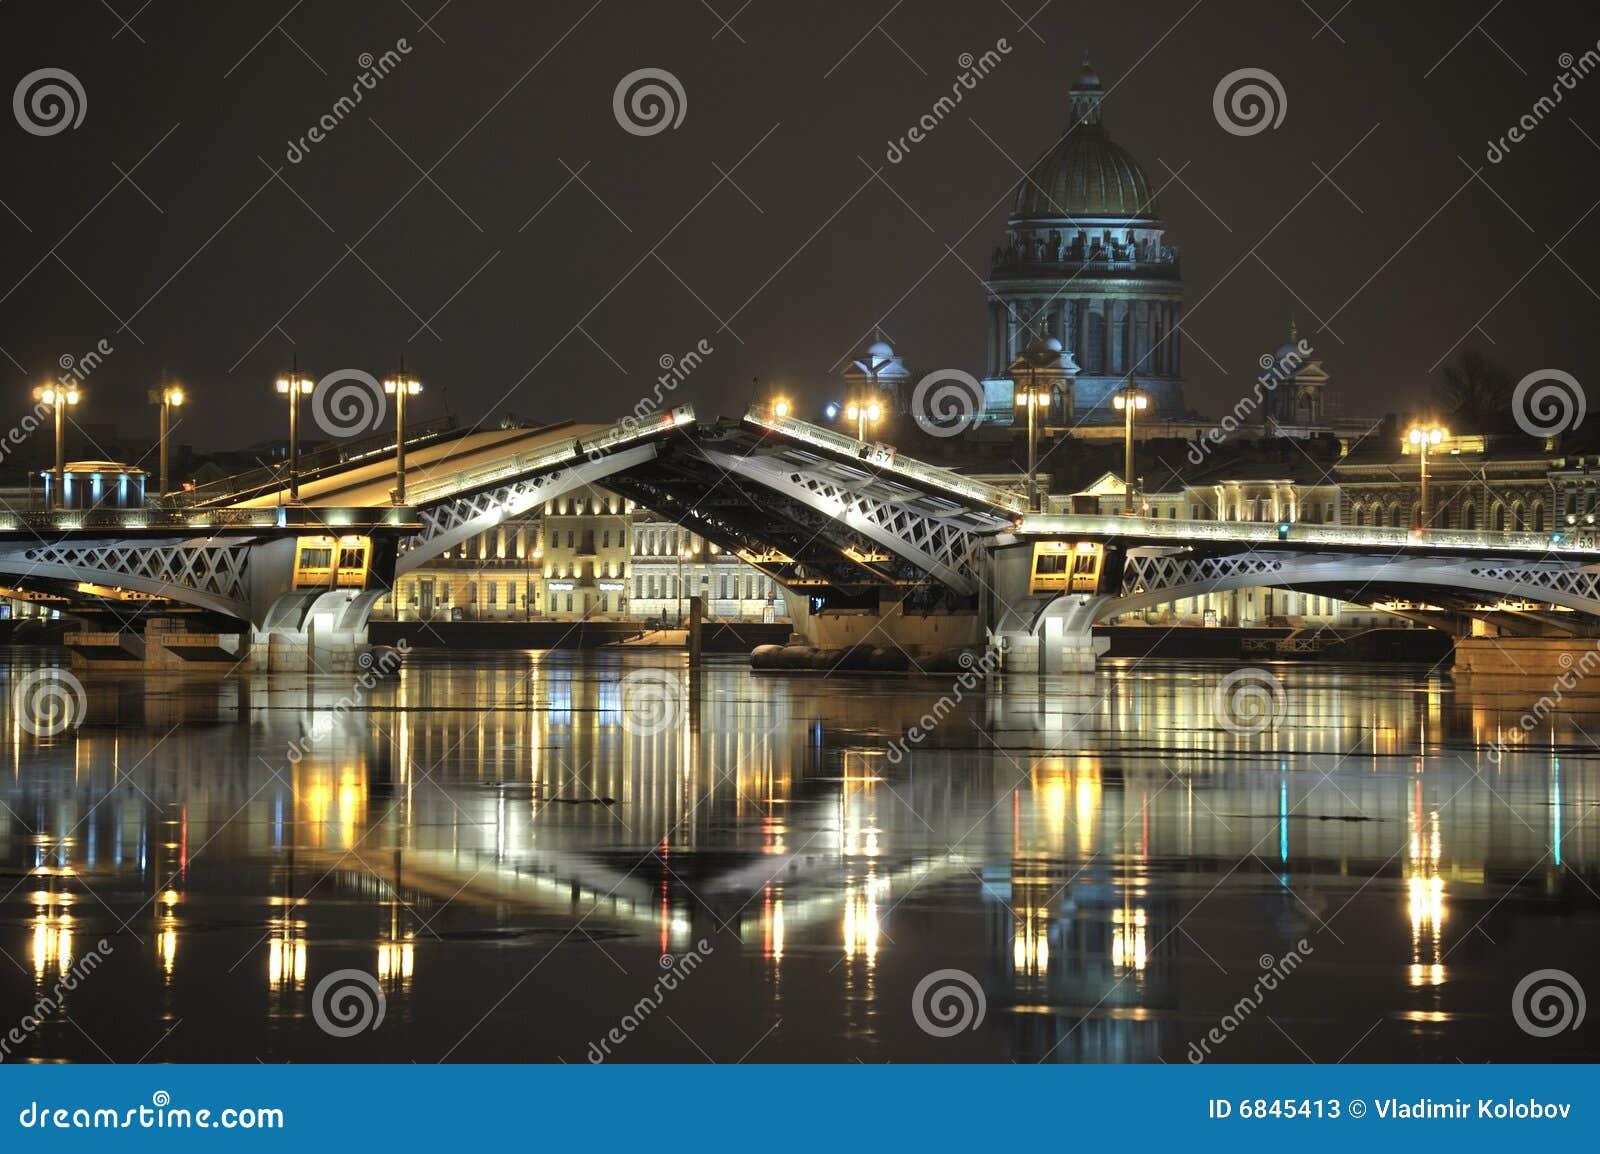 Drawing of a bridge.